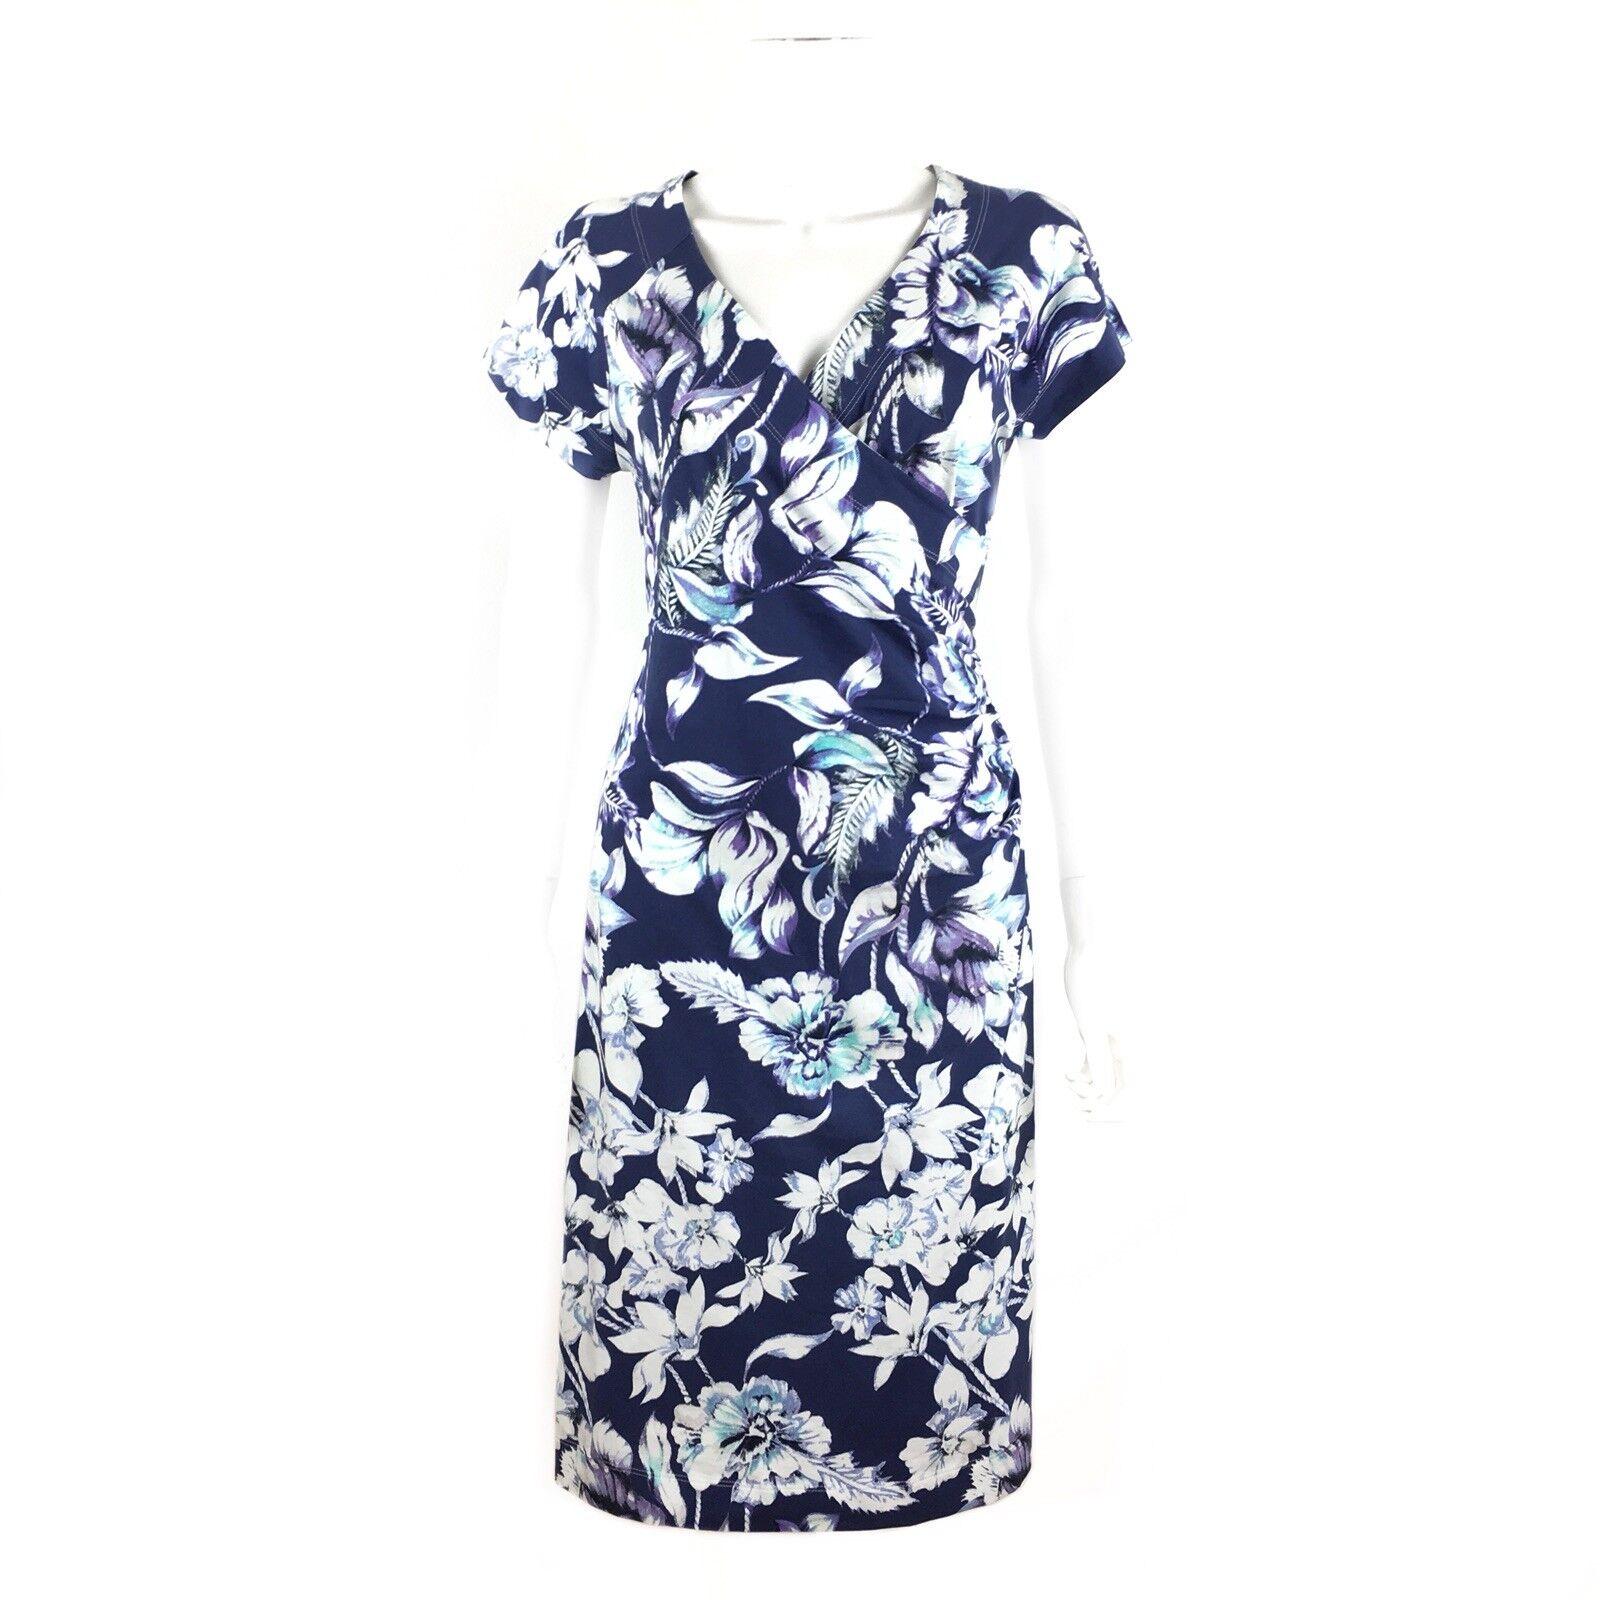 Soft Surroundings Shapely Anywhere bluee Indigo Faux Wrap Stretch Dress Sz Medium